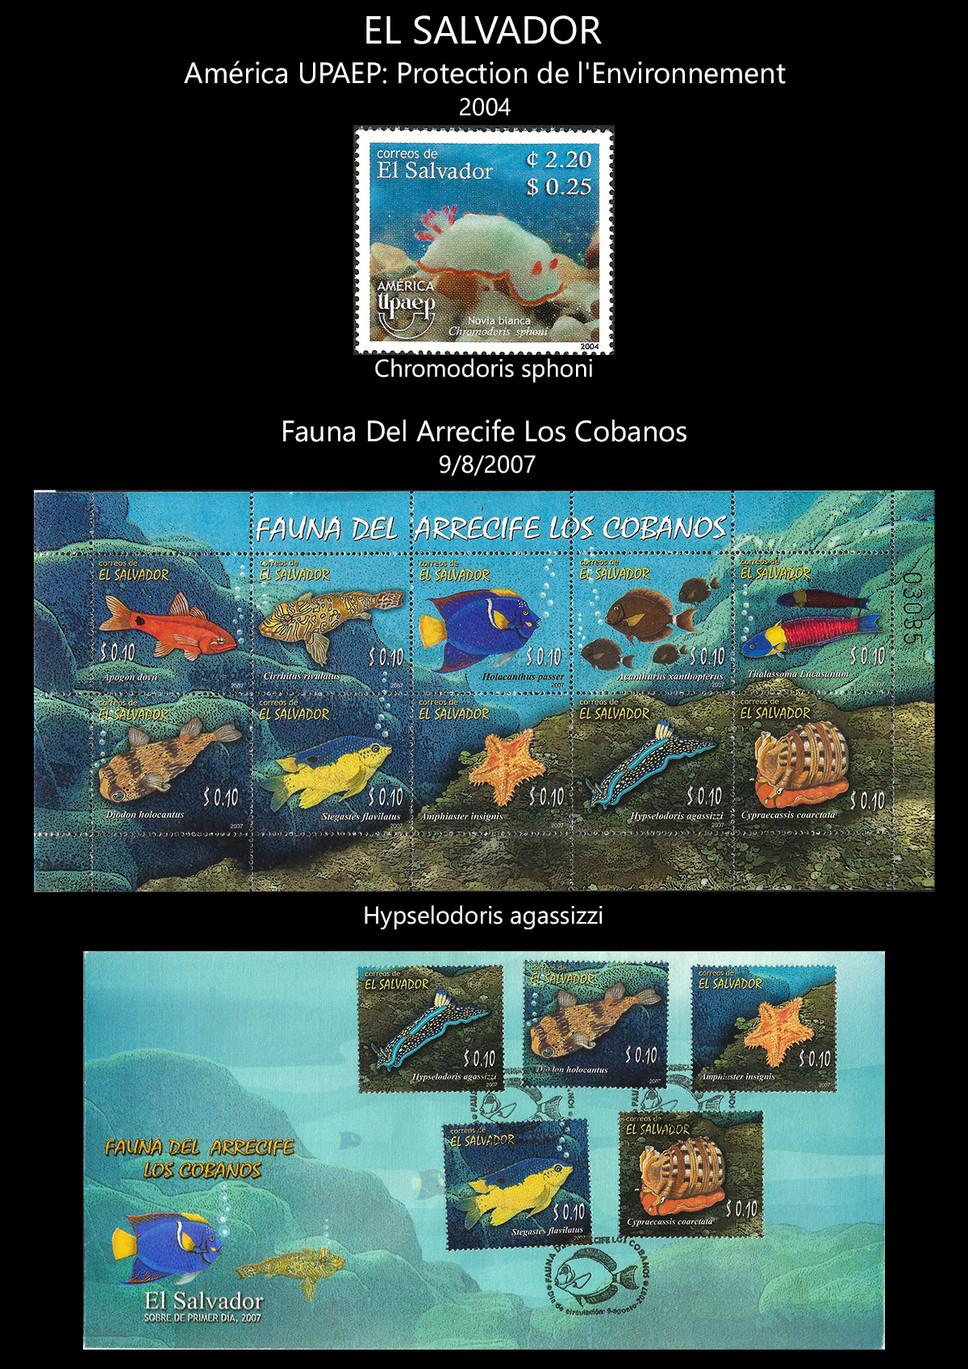 el salvador Stamps & FDC